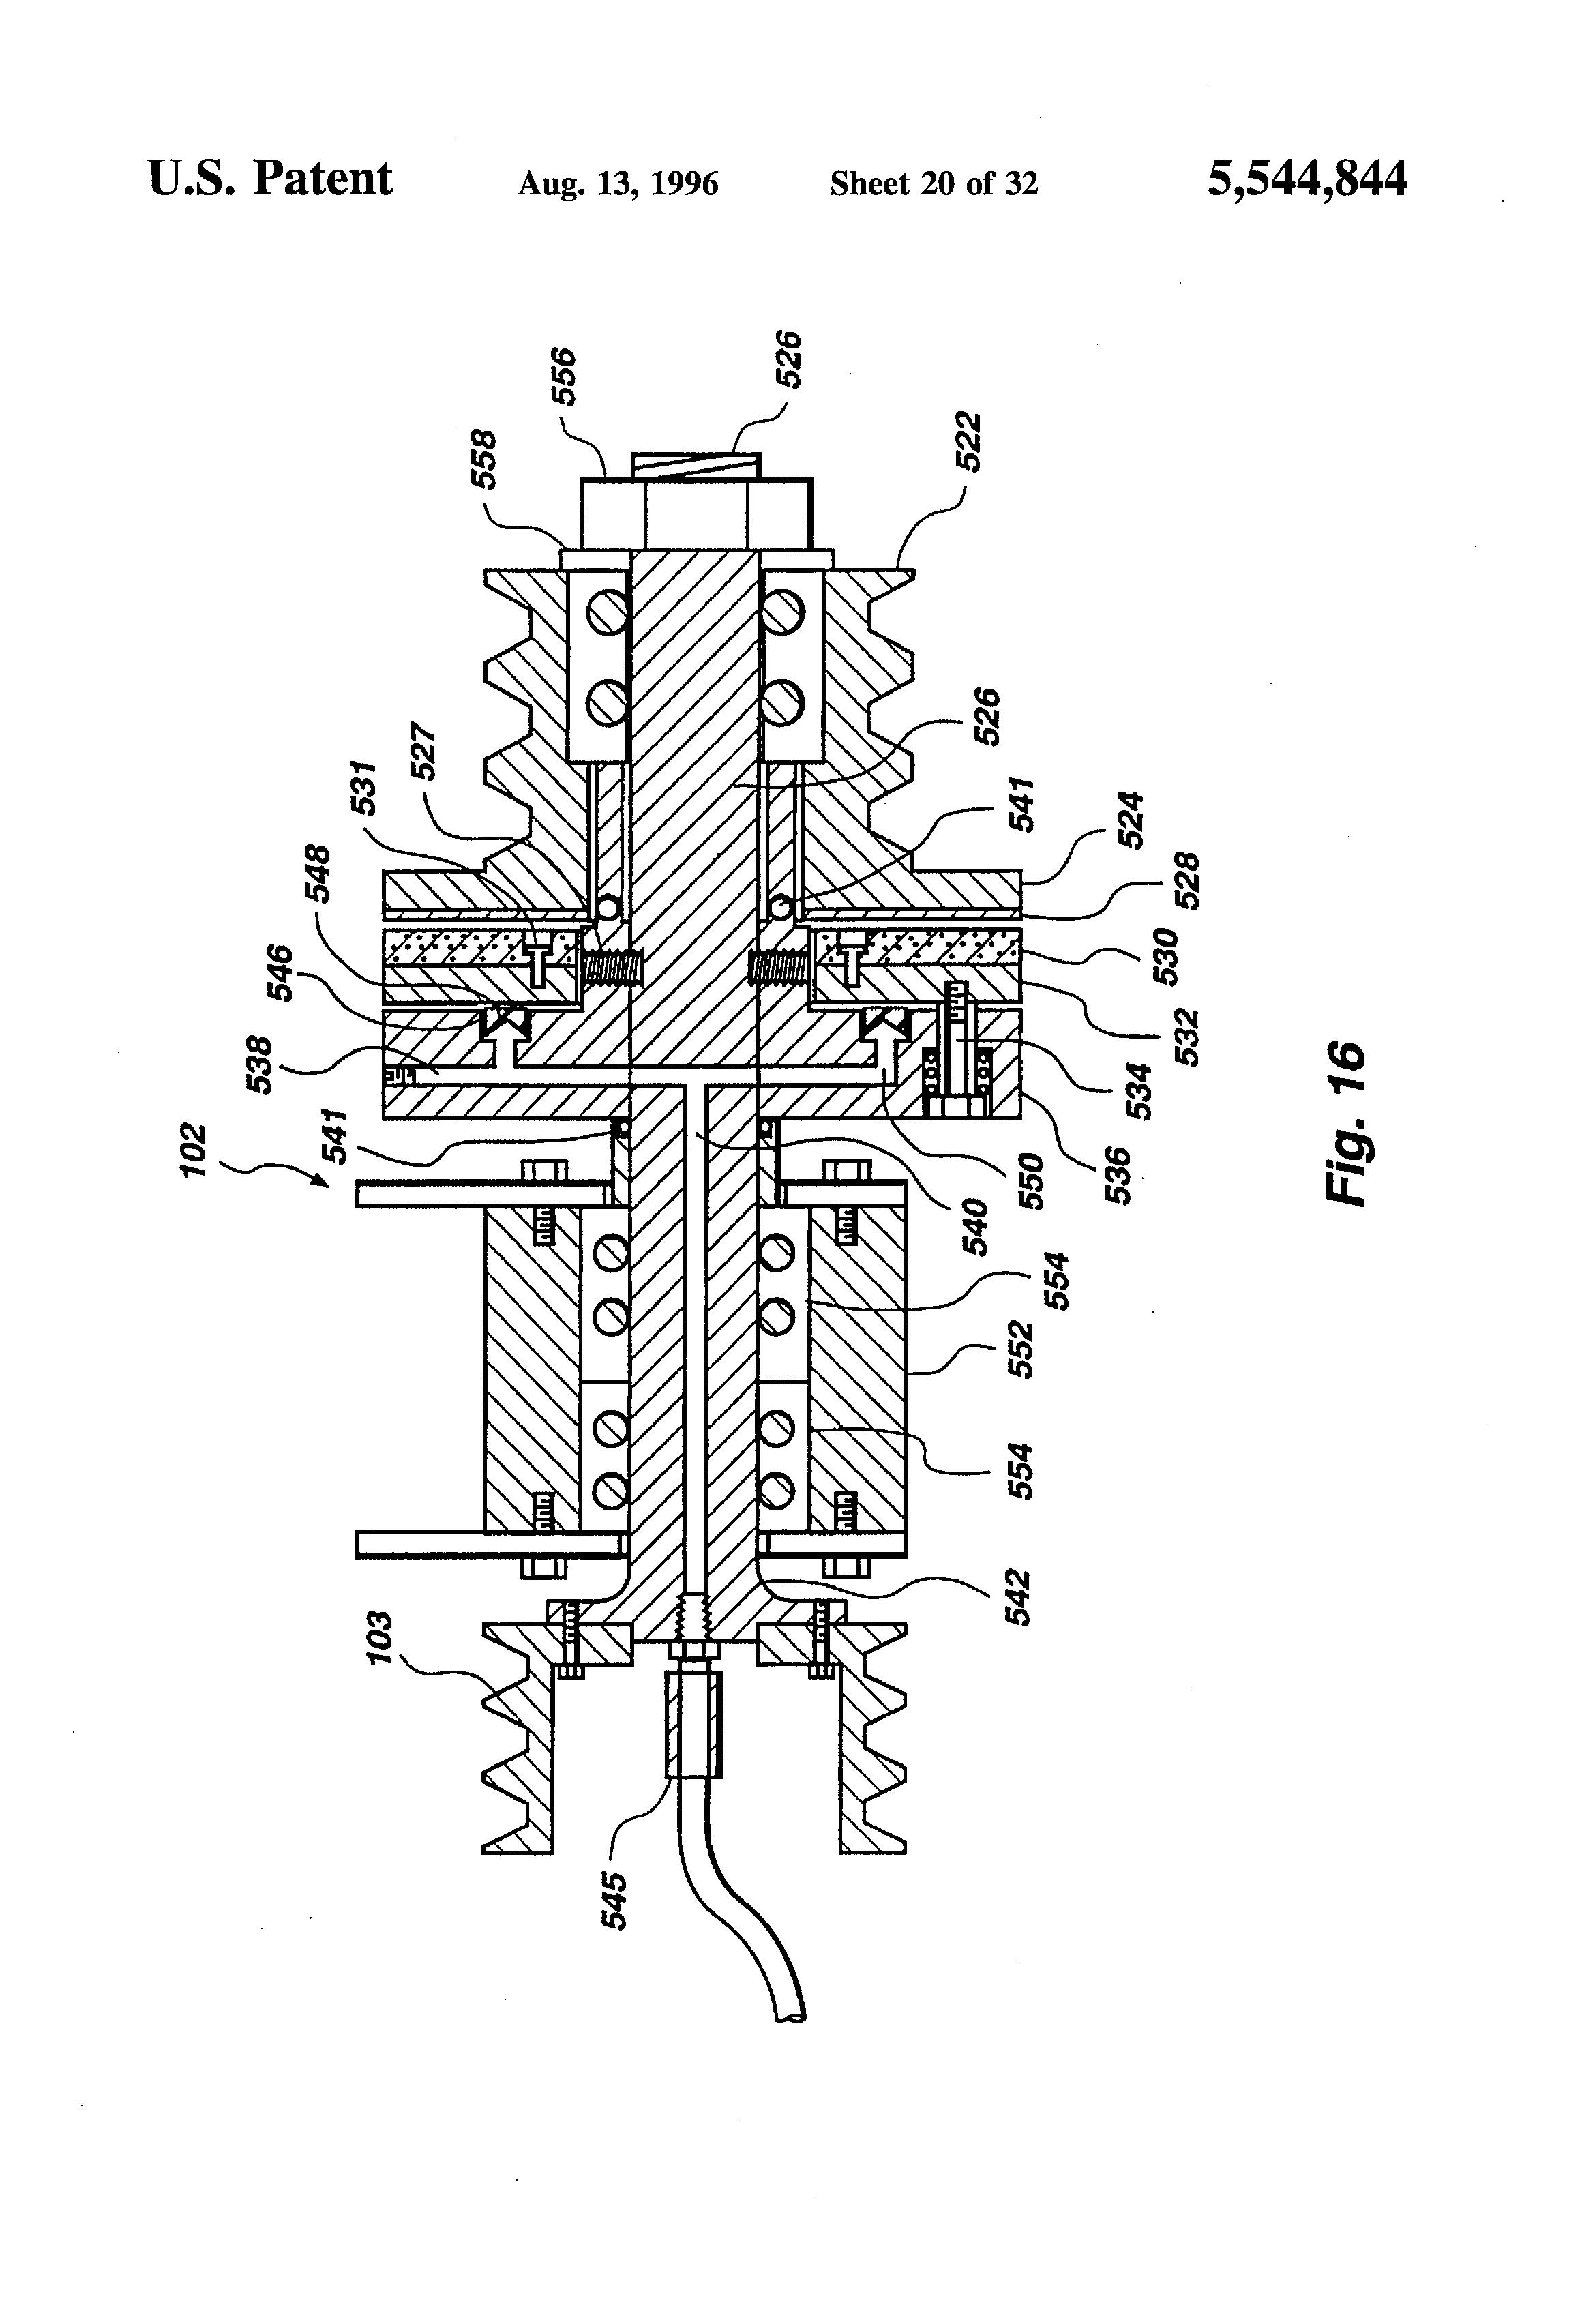 Funky Free Sample Motion Sensor Wiring Diagram Sketch - Electrical ...